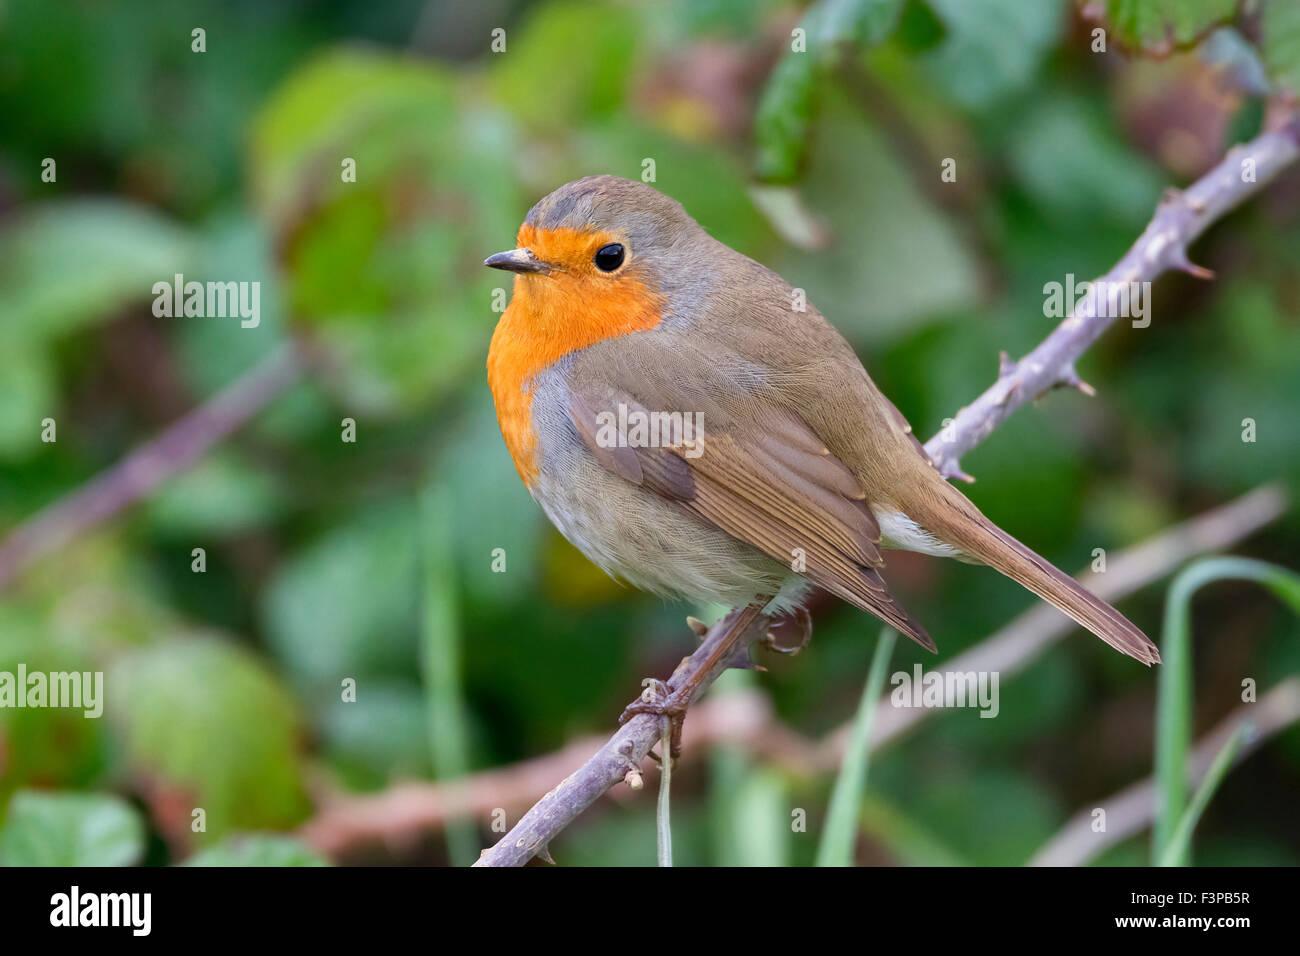 European Robin, perched on a branch, Campania, Italy (Erithacus rubecula) - Stock Image